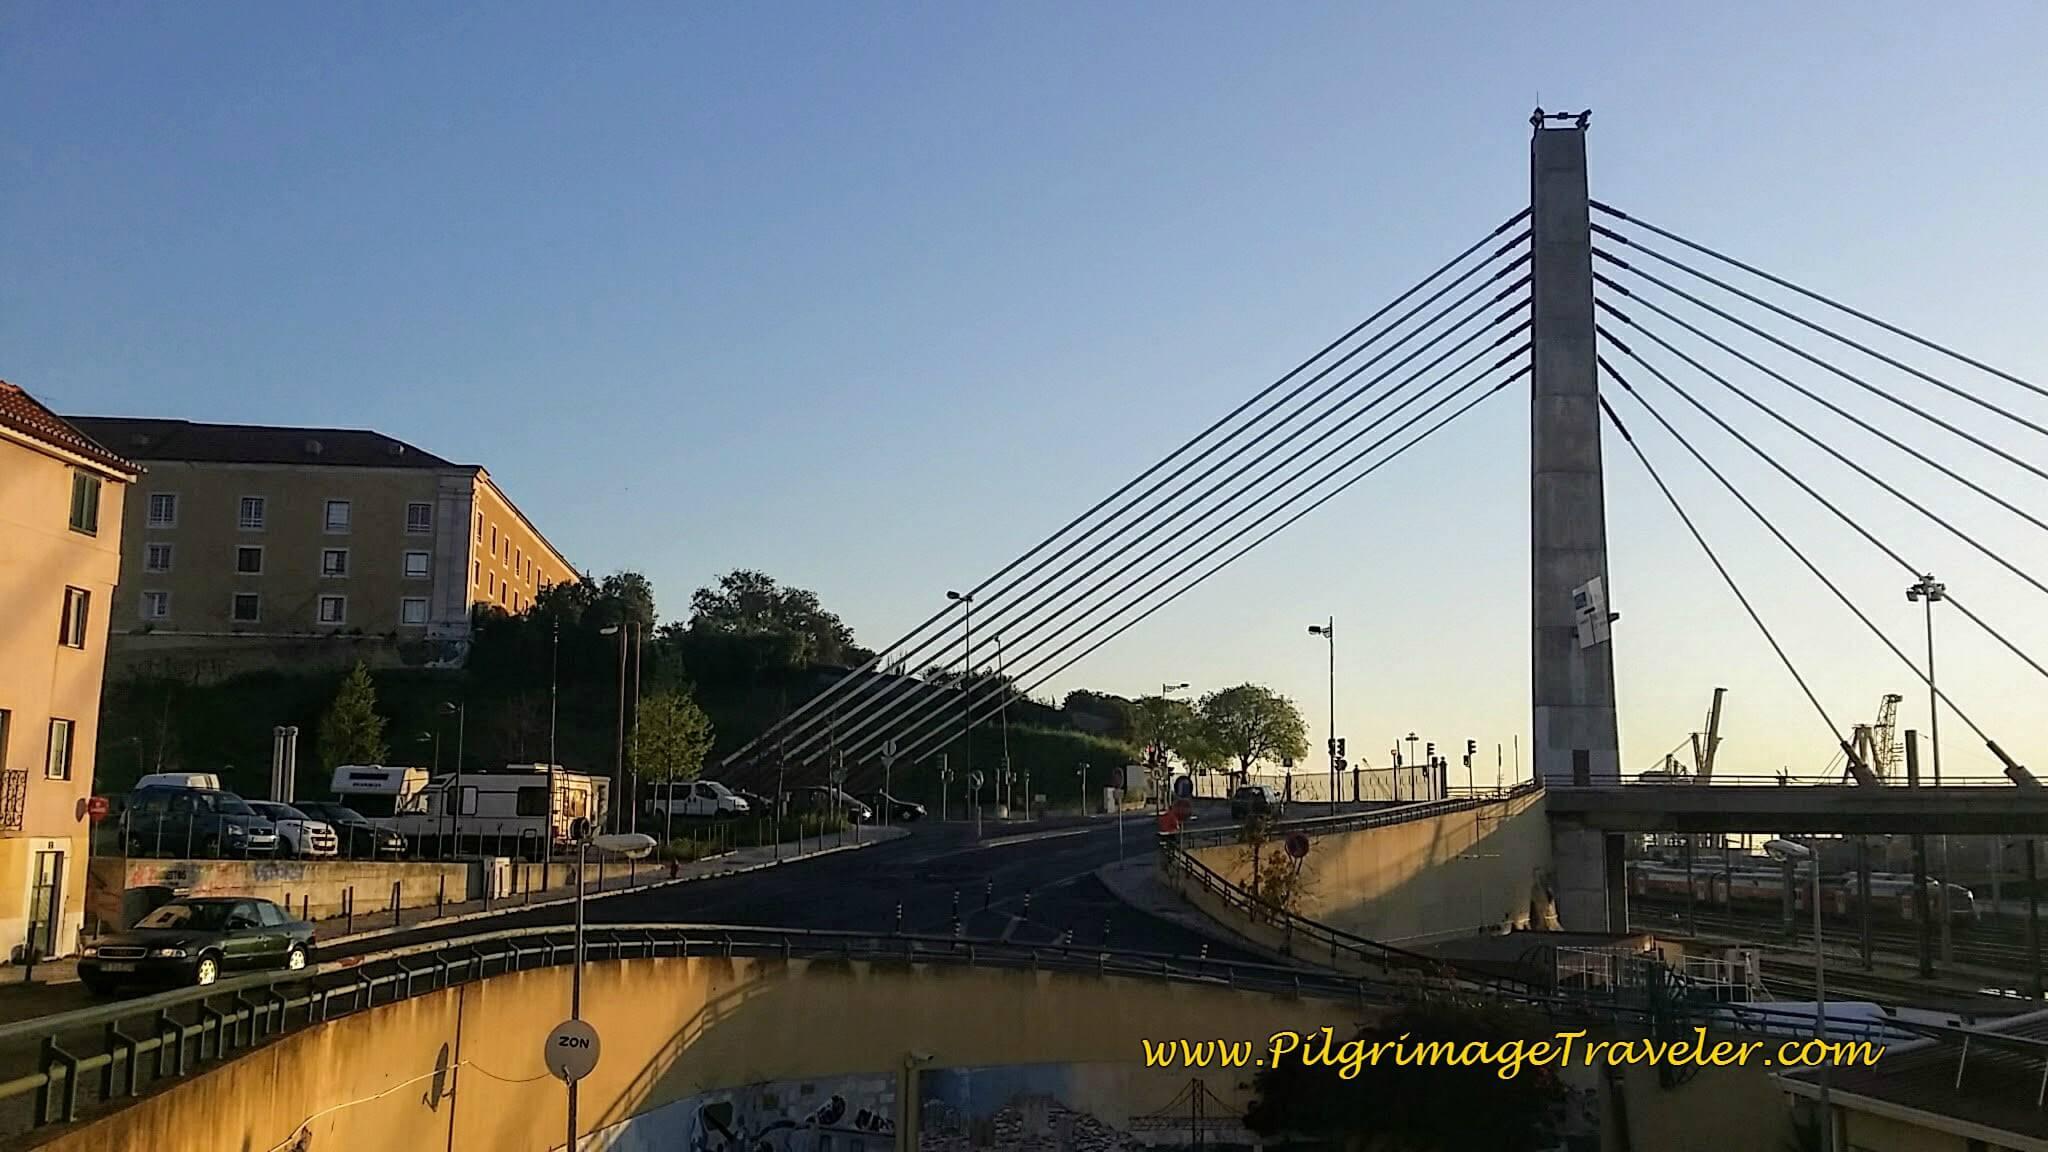 Rua de Santa Apolónia and Bridge after leaving Lisbon on the first day of the Camino Portugués